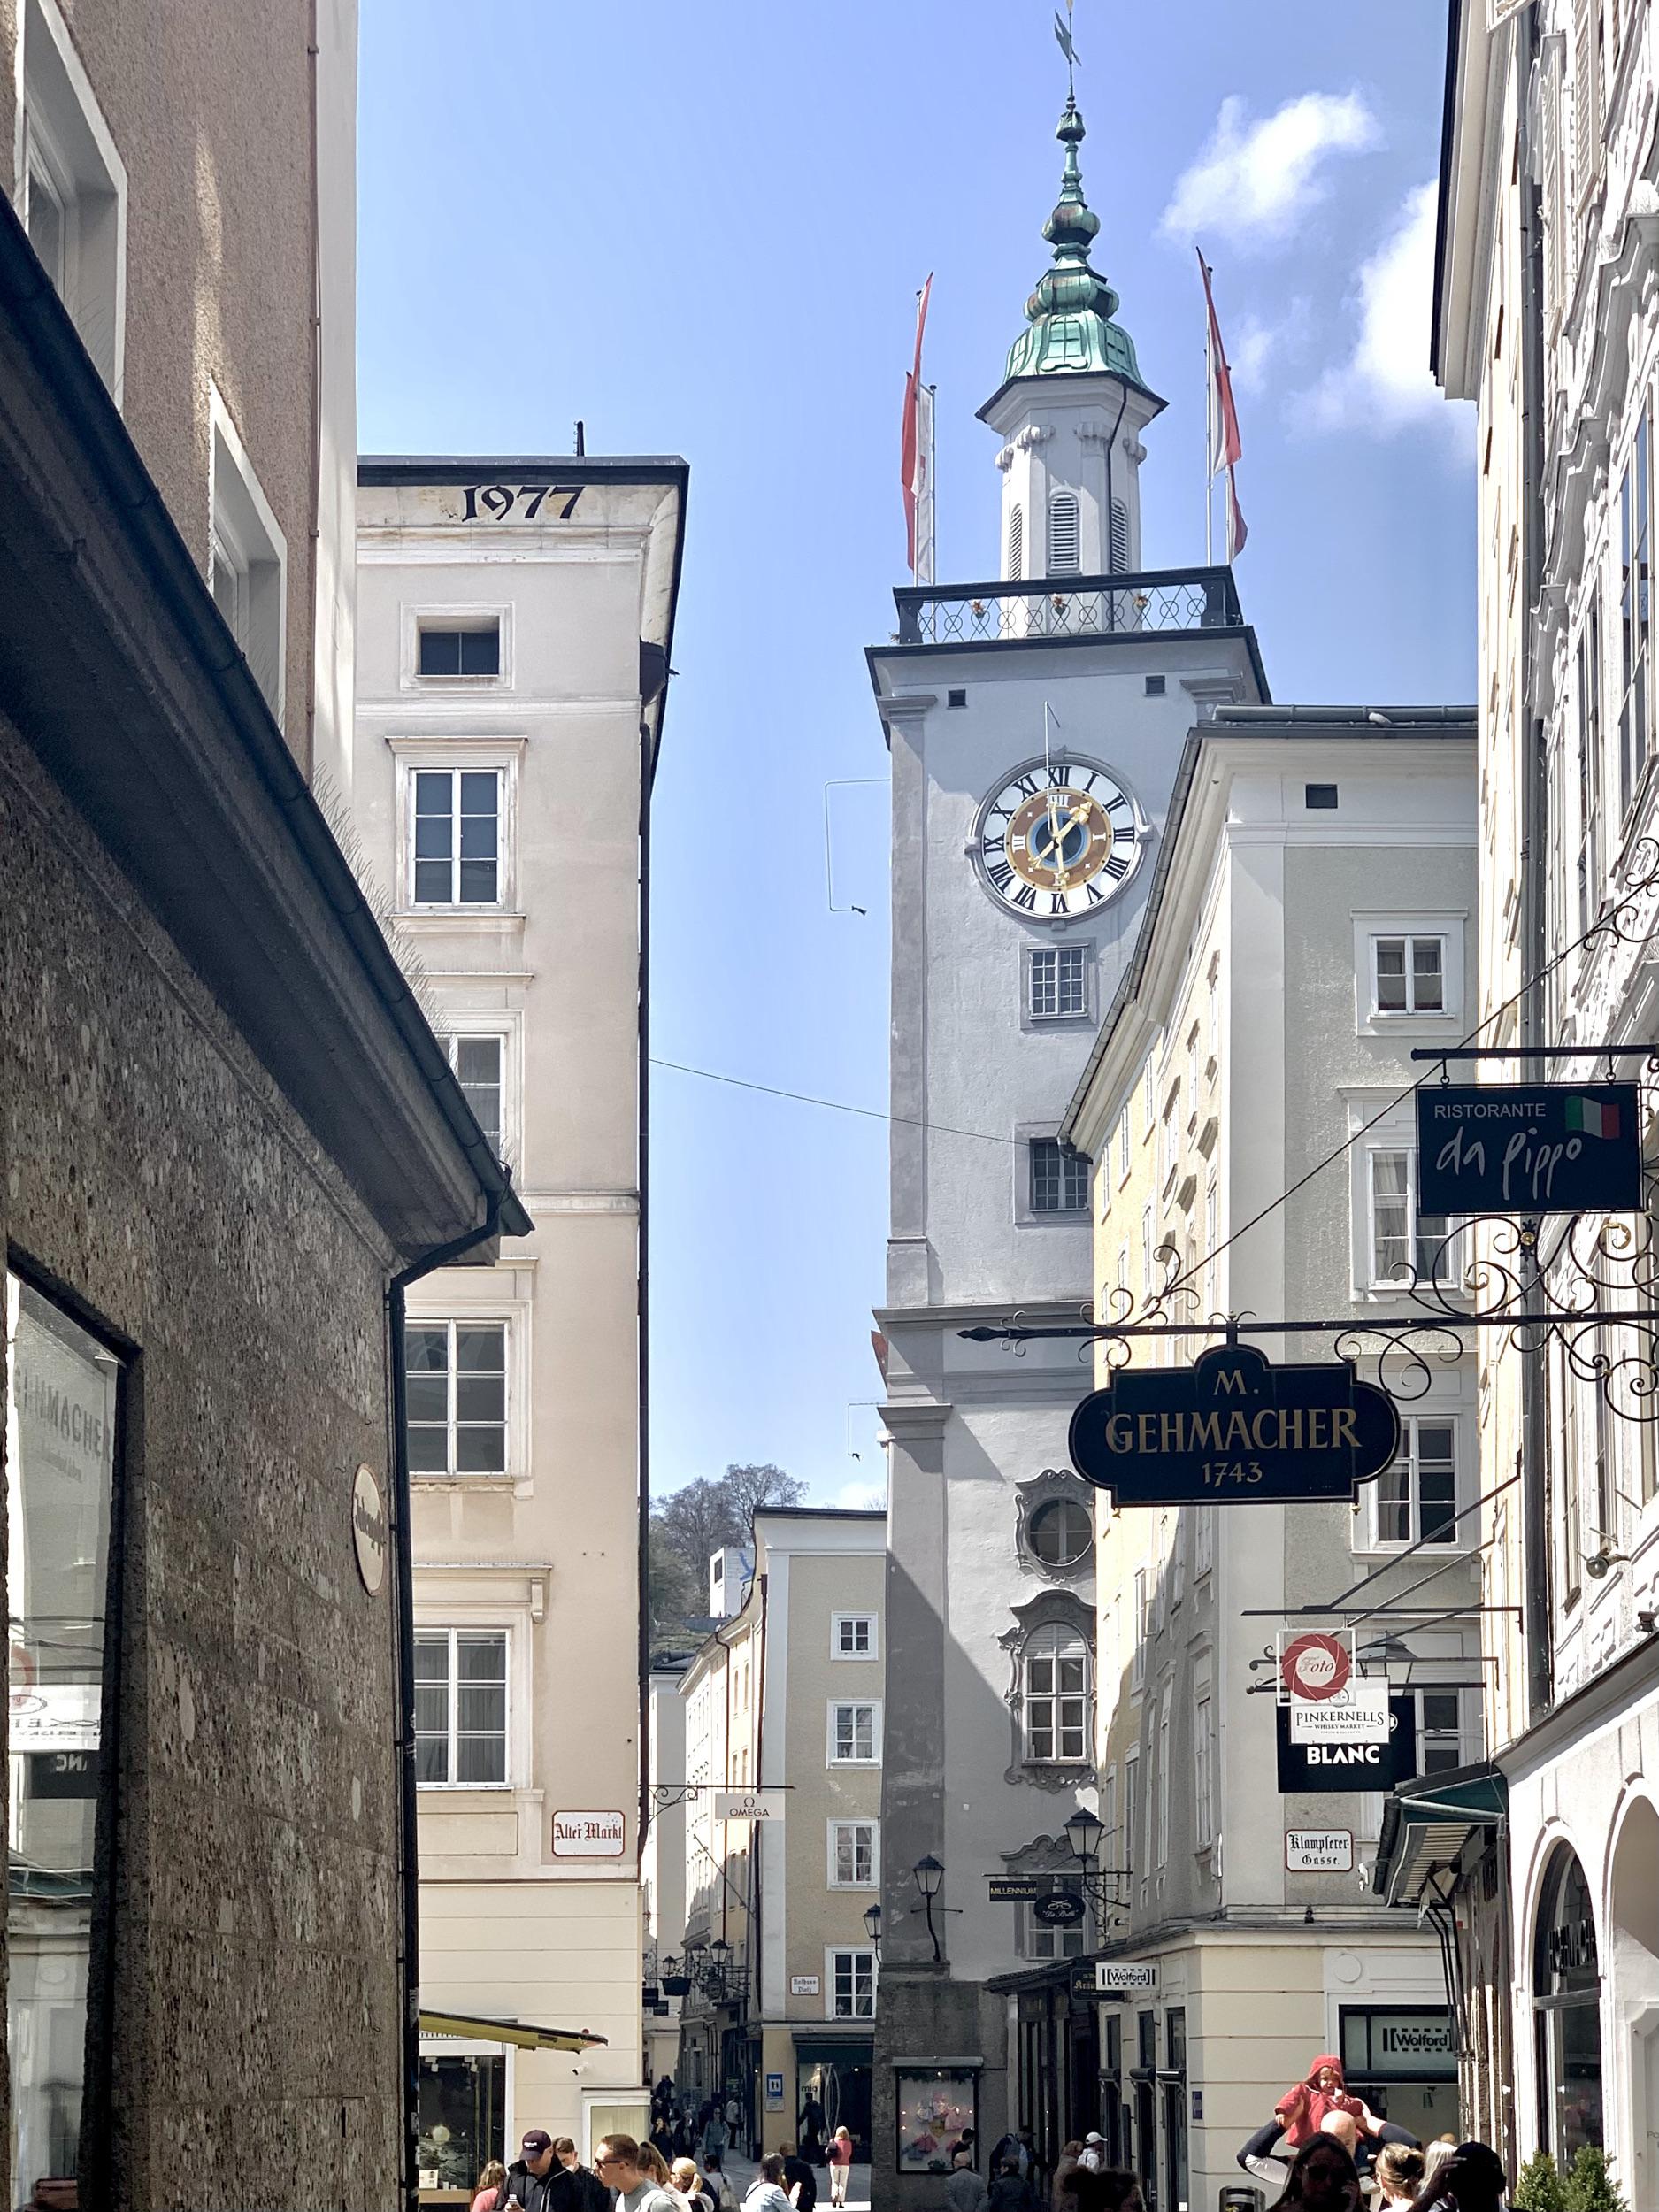 Salzburg Town Hall Tower